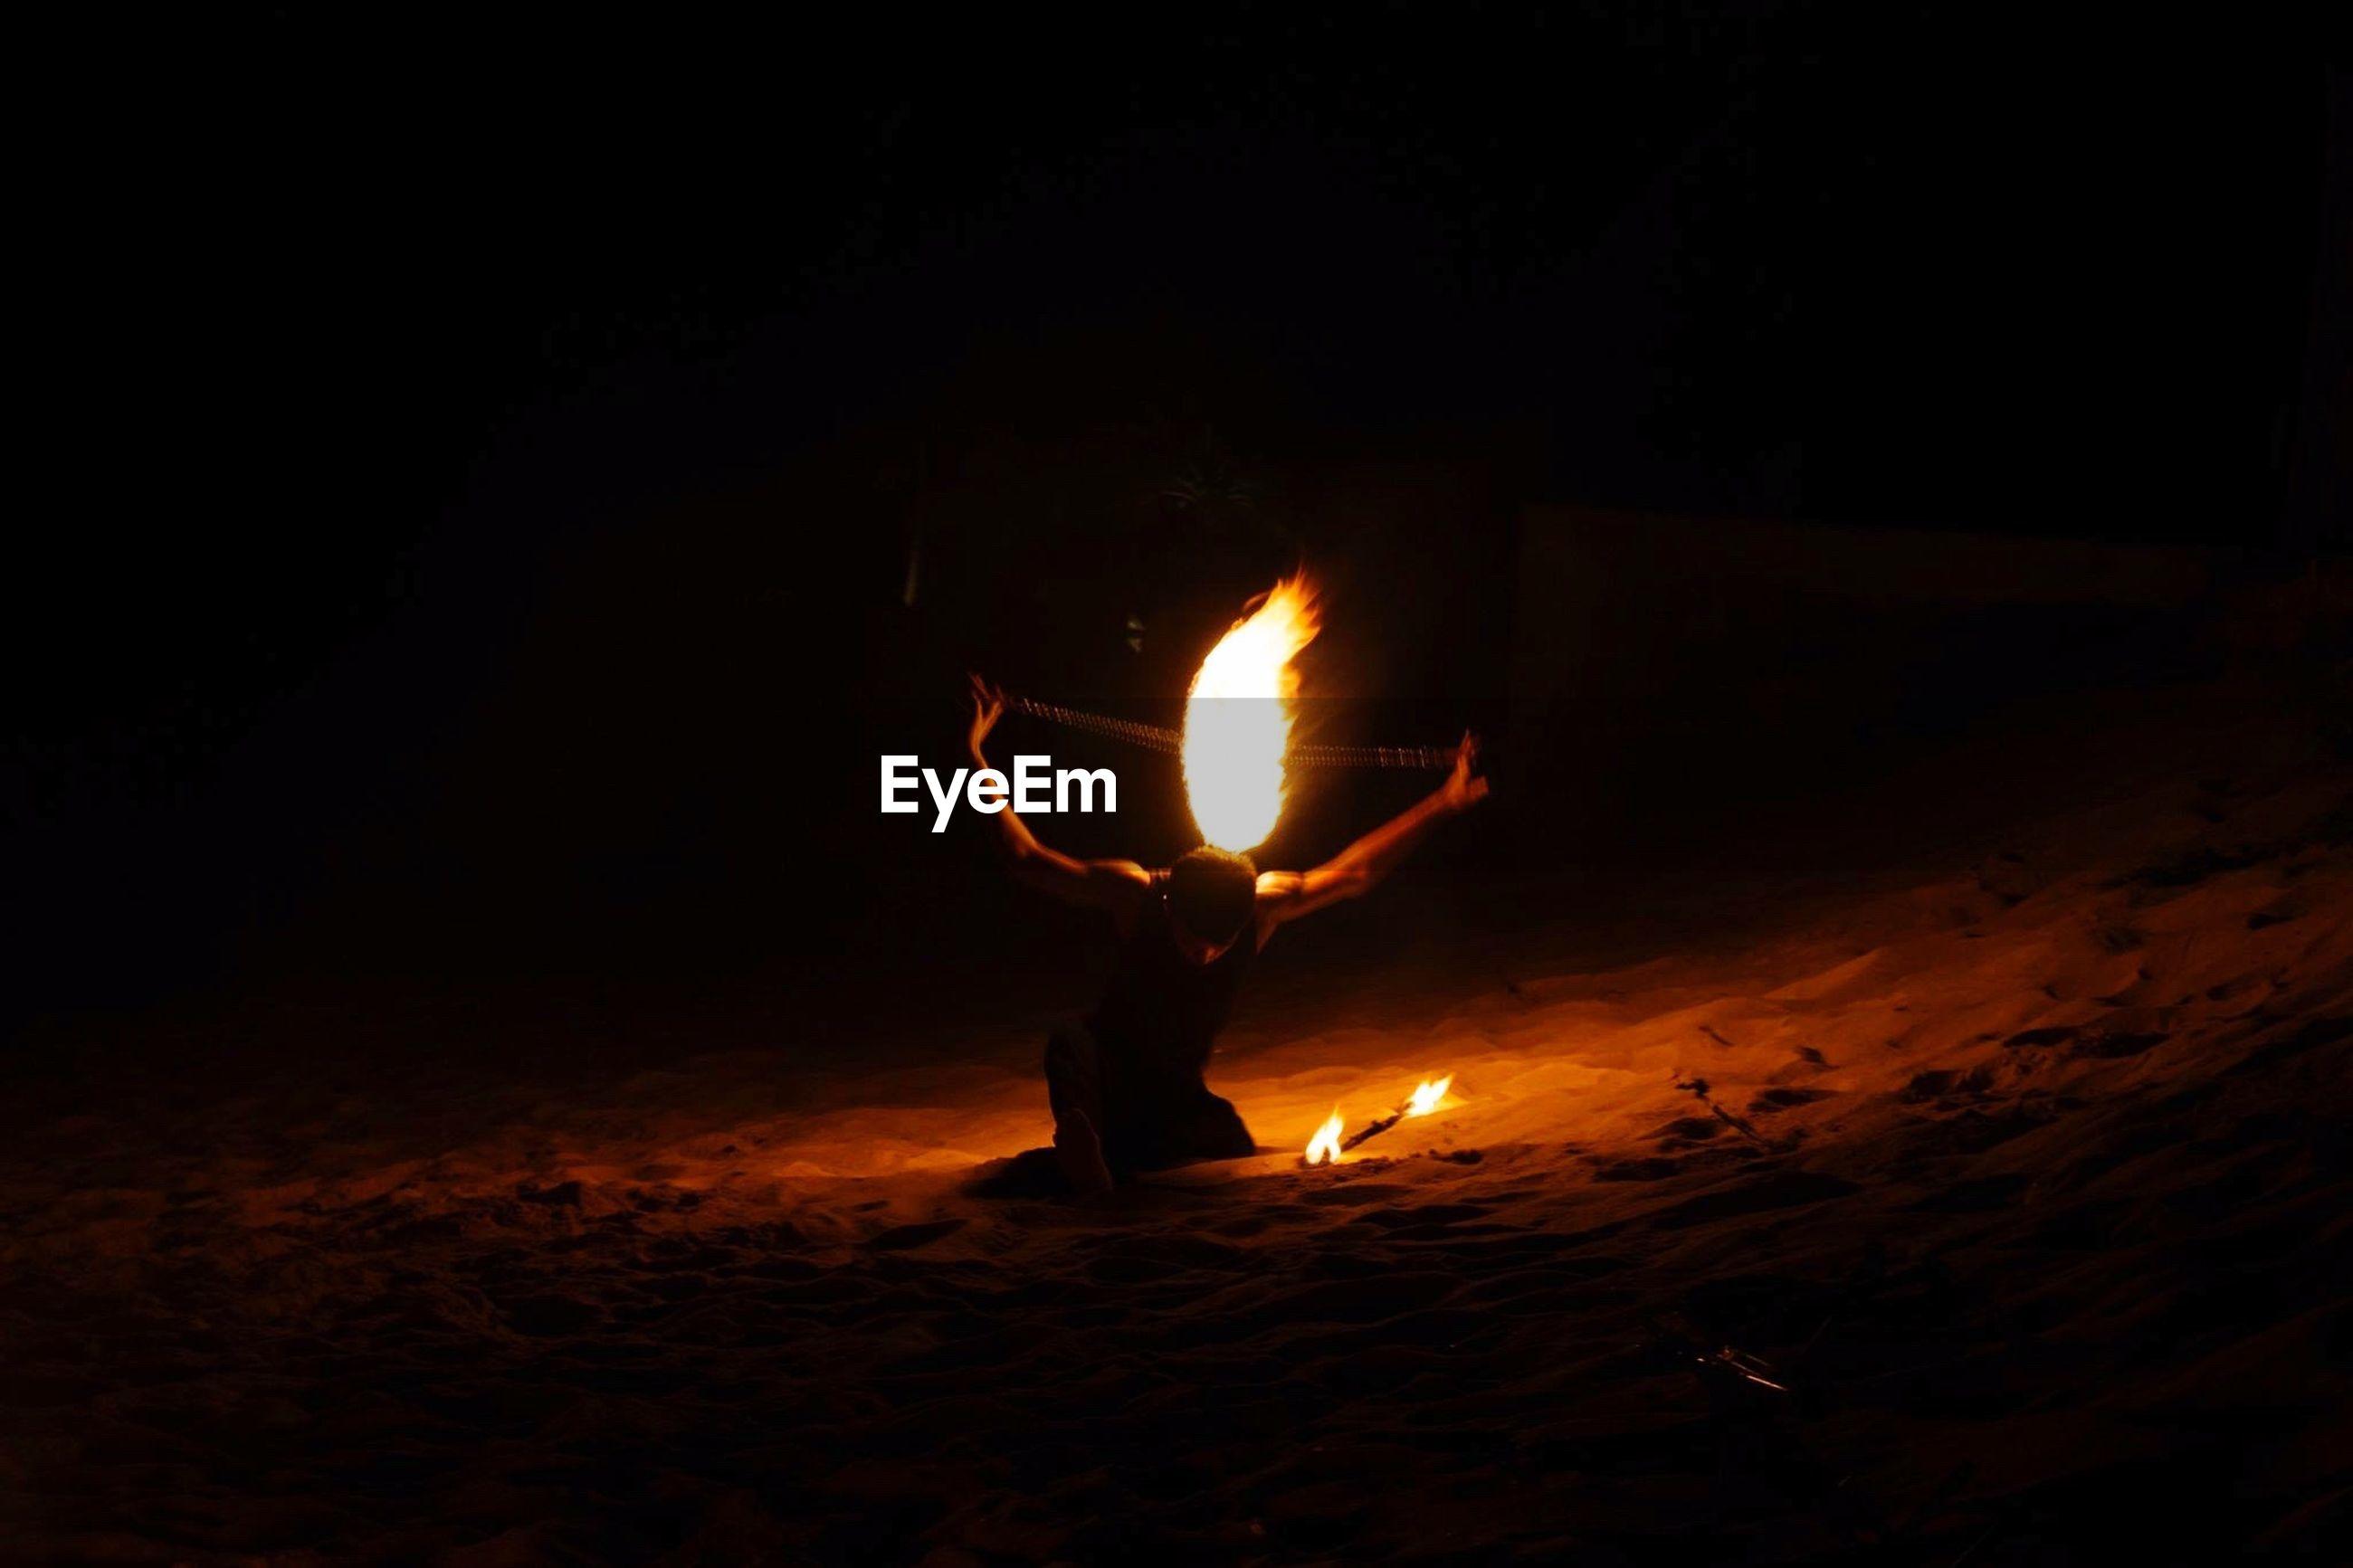 burning, flame, fire - natural phenomenon, heat - temperature, night, men, lifestyles, leisure activity, fire, silhouette, glowing, bonfire, dark, illuminated, standing, heat, holding, campfire